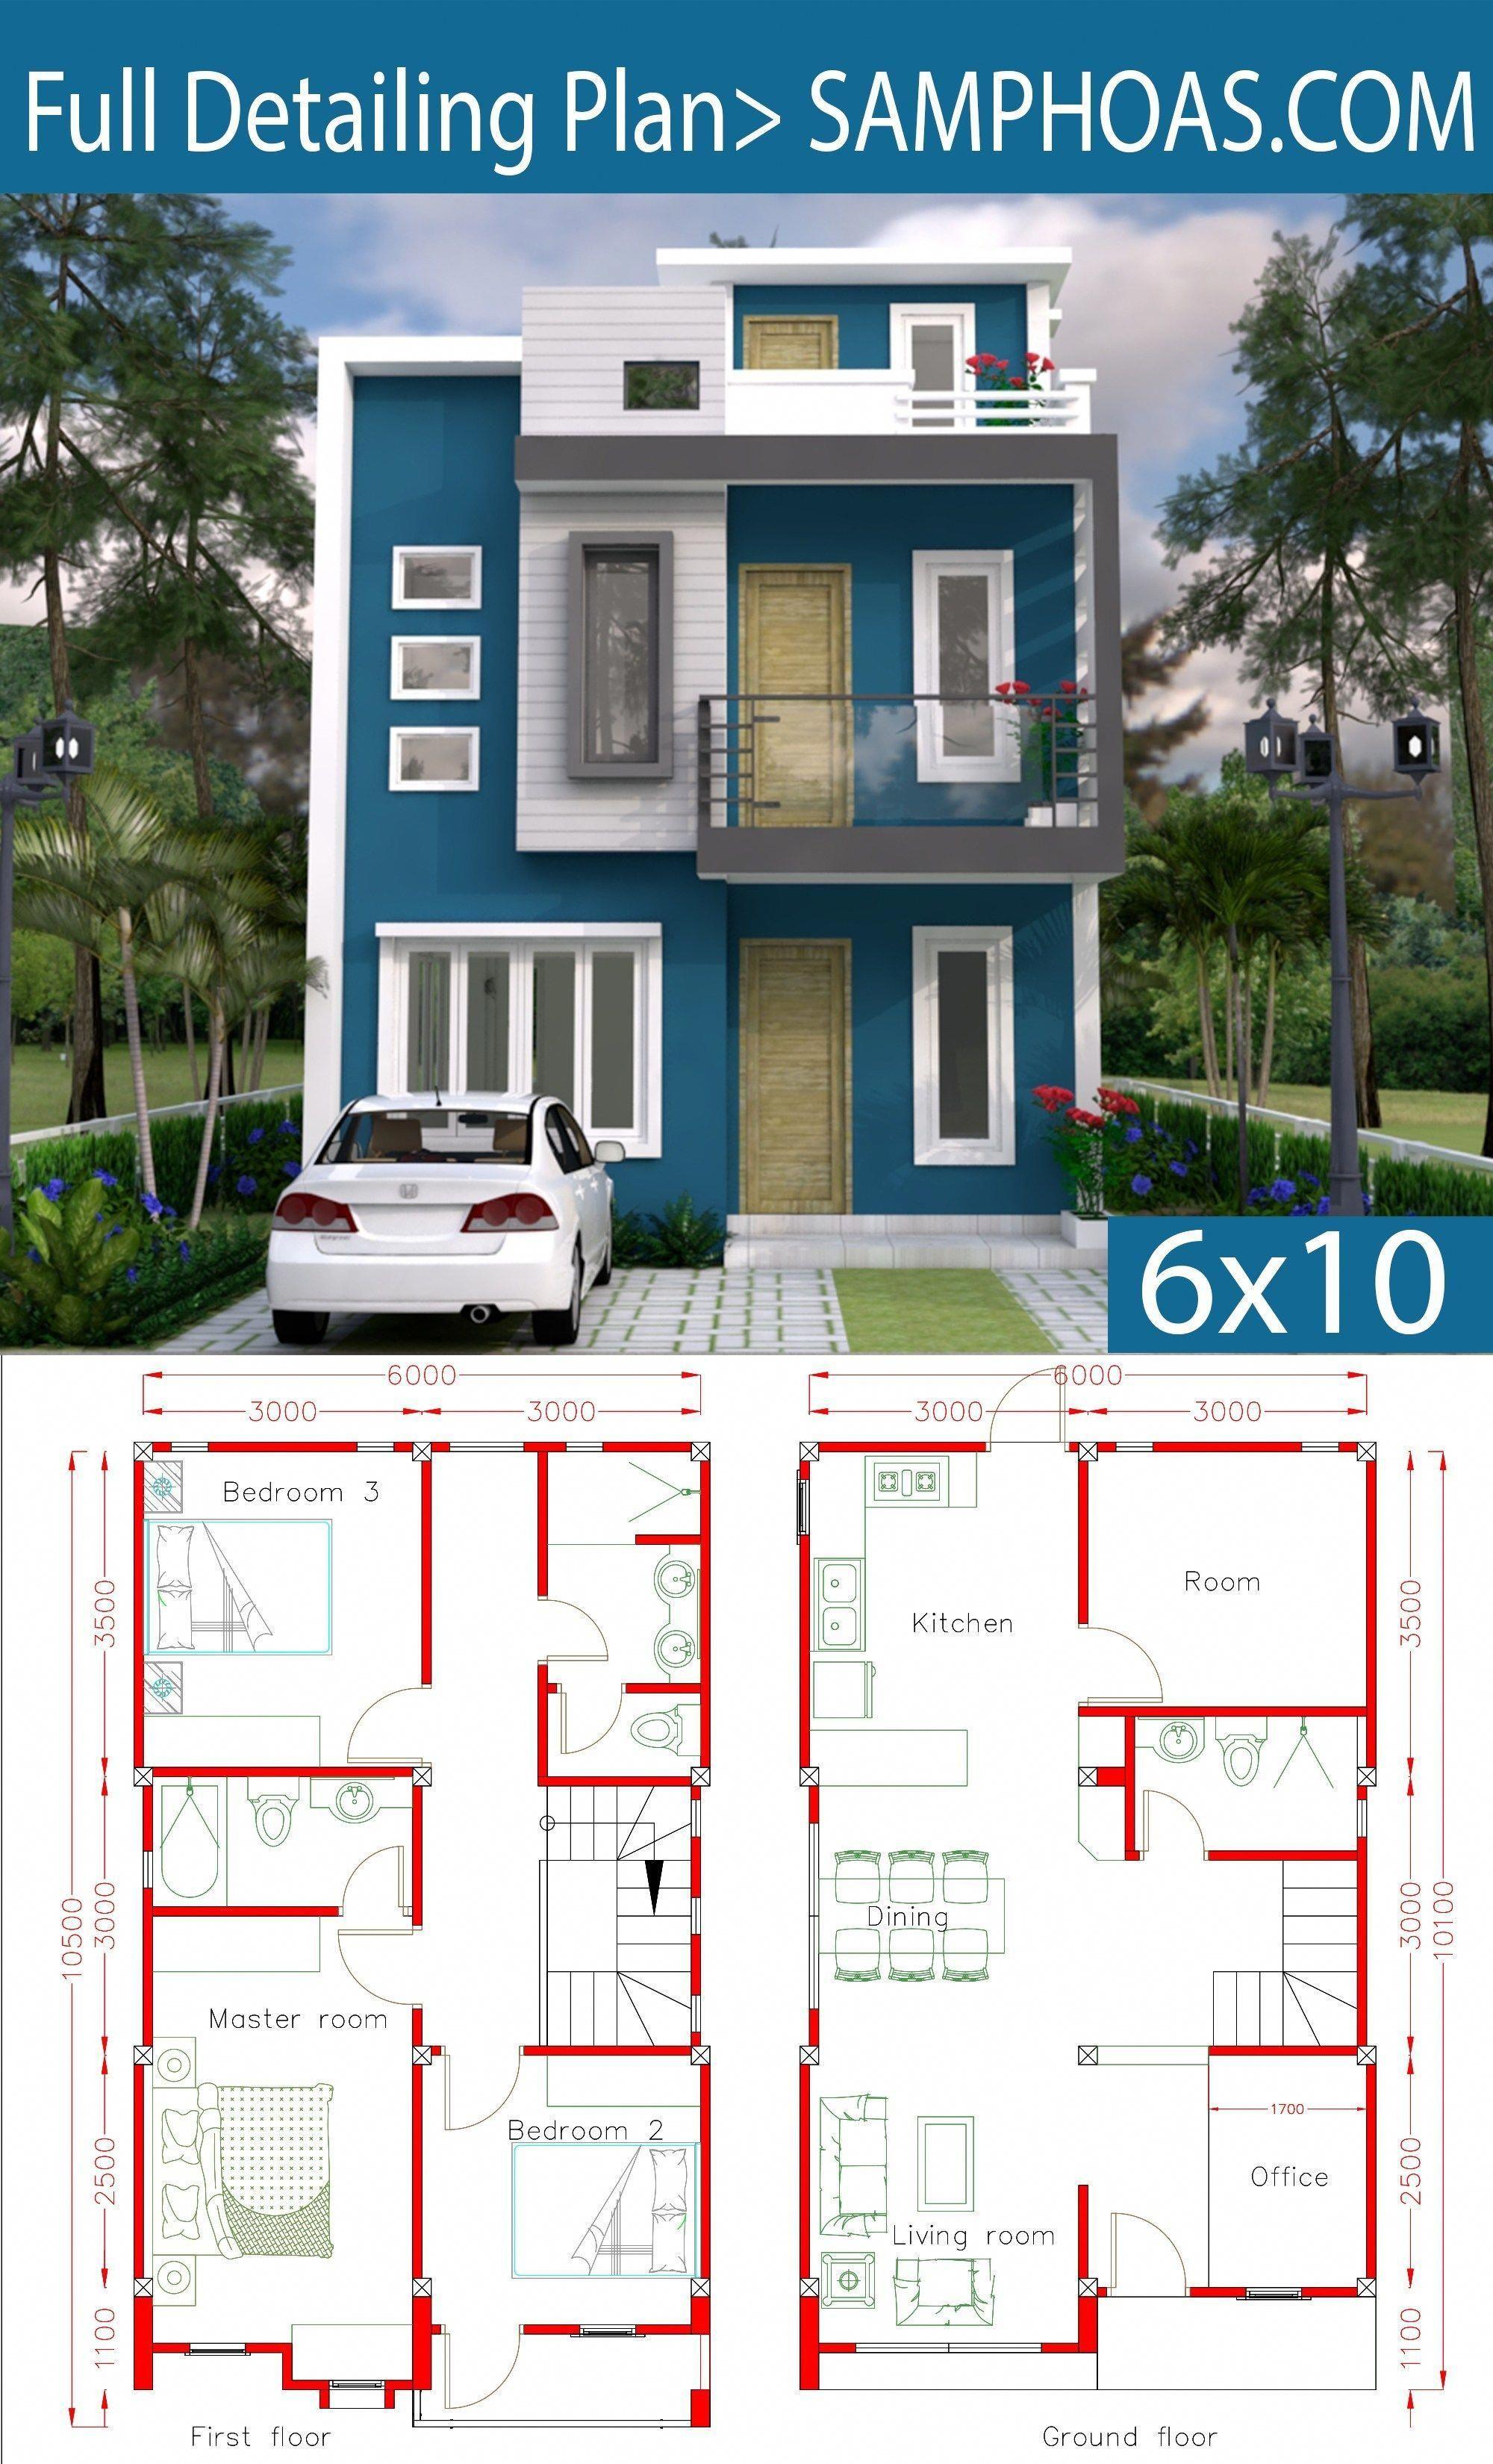 Dream Houses Plans Dreamhouses Dream Dreamhouses Houses Plans Architectural House Plans Model House Plan House Layout Plans